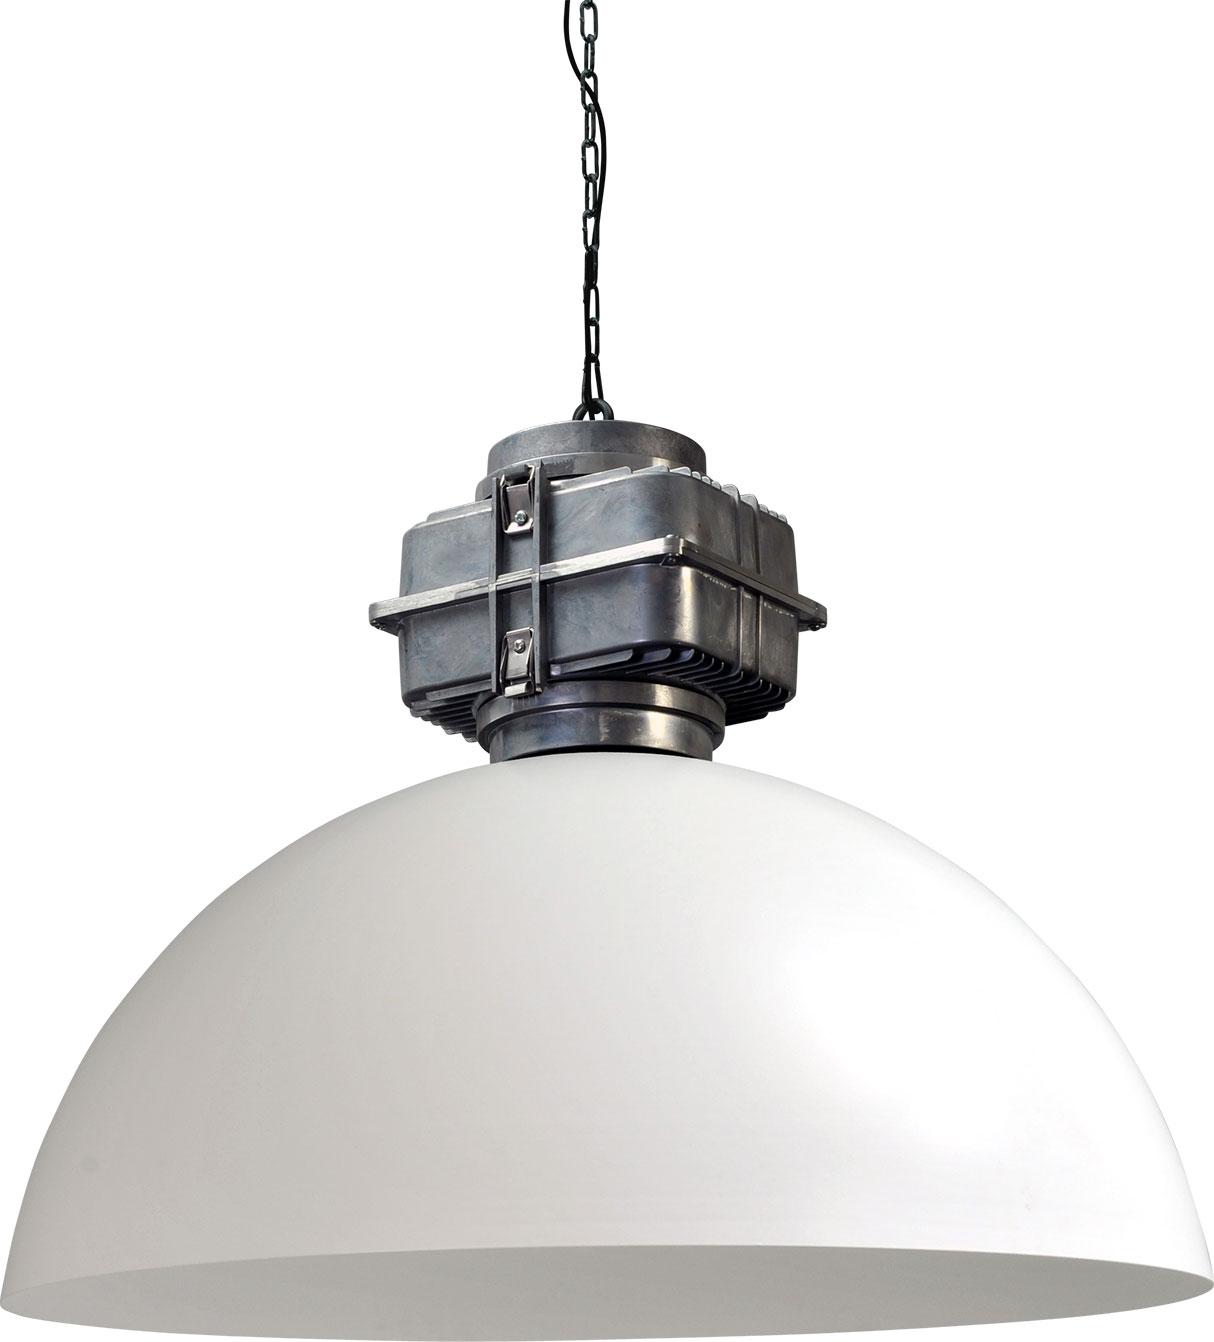 larino 2201 06 06 BL - Lamp Larino Motorblok Wit